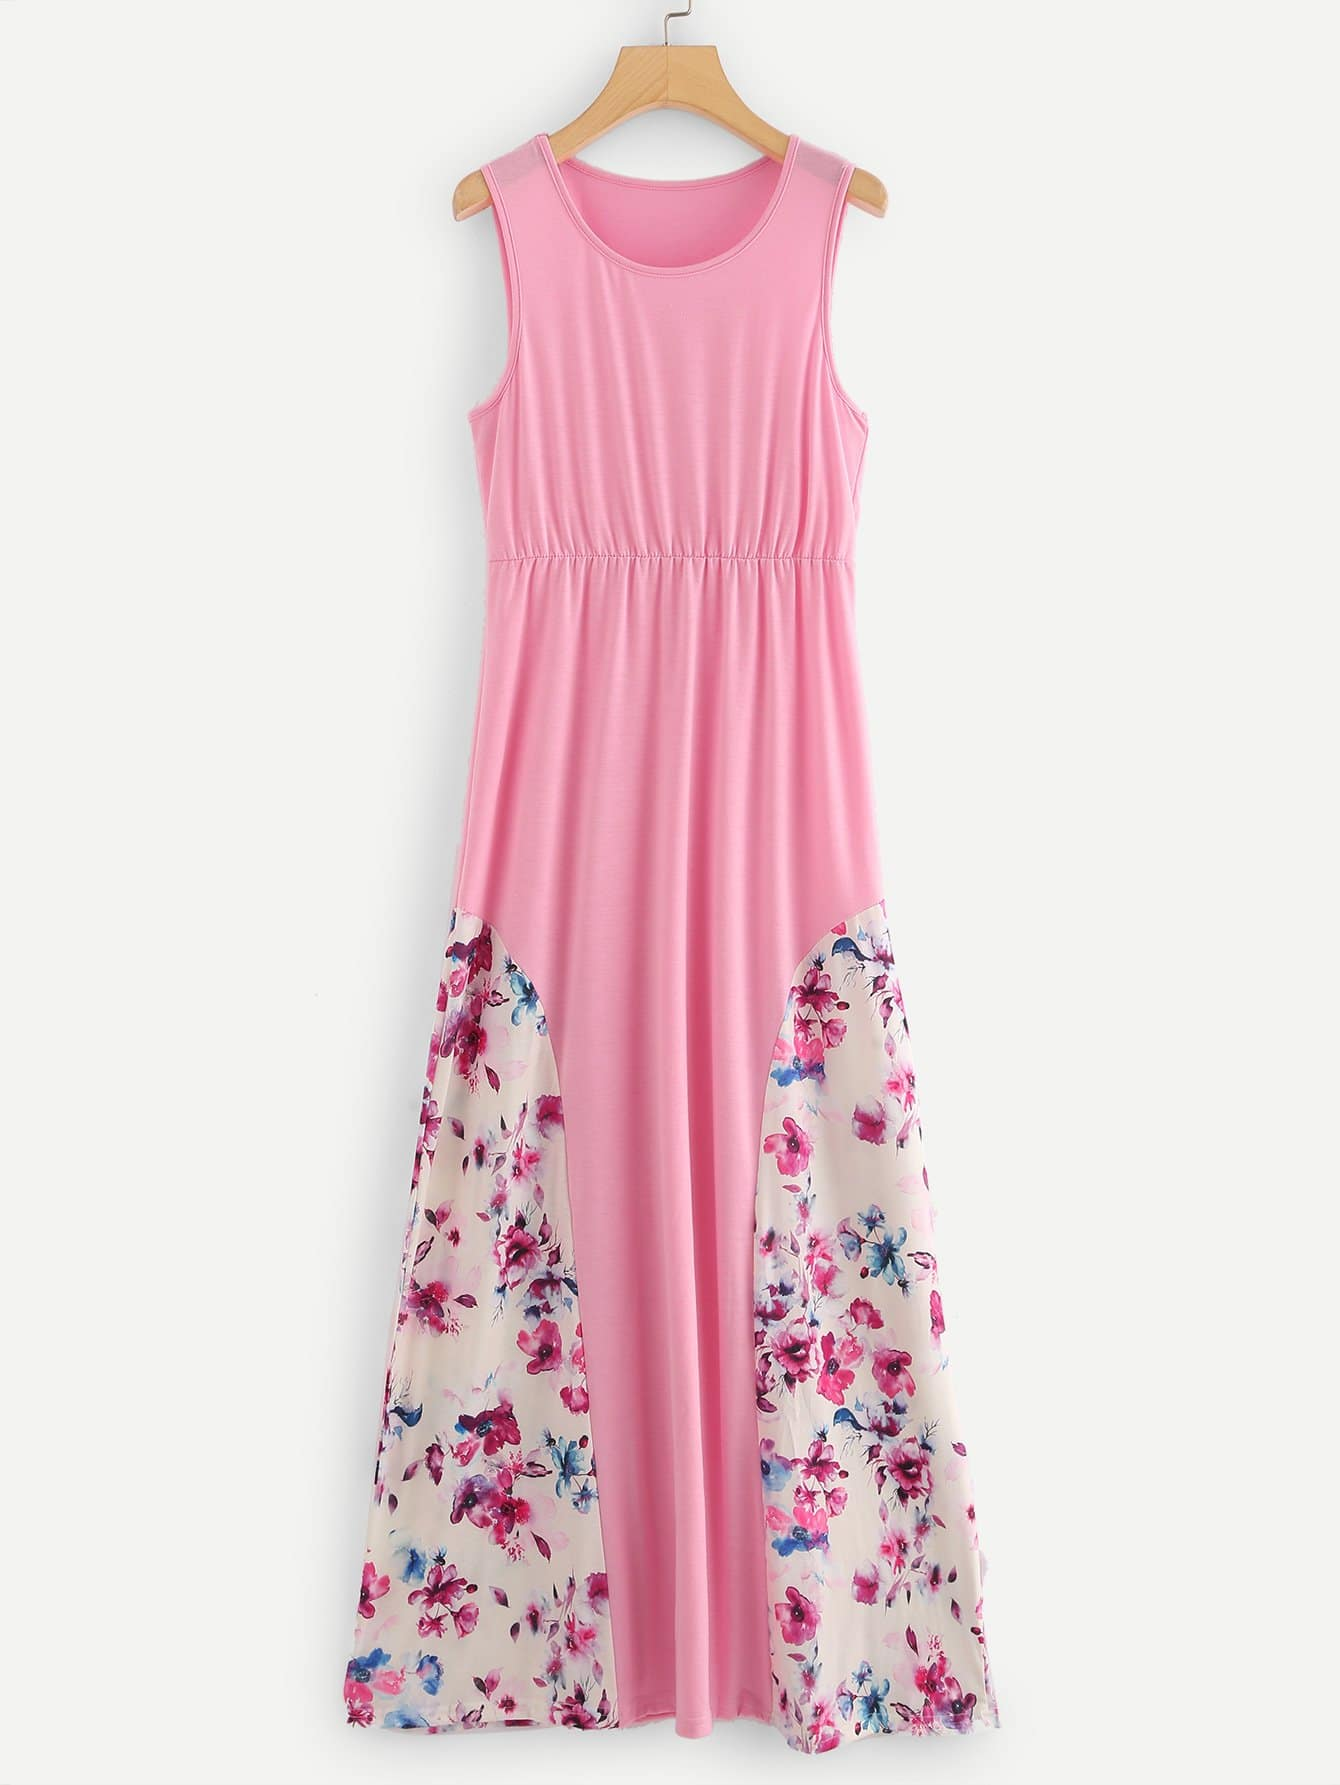 Calico Print Contrast Dress calico print tights